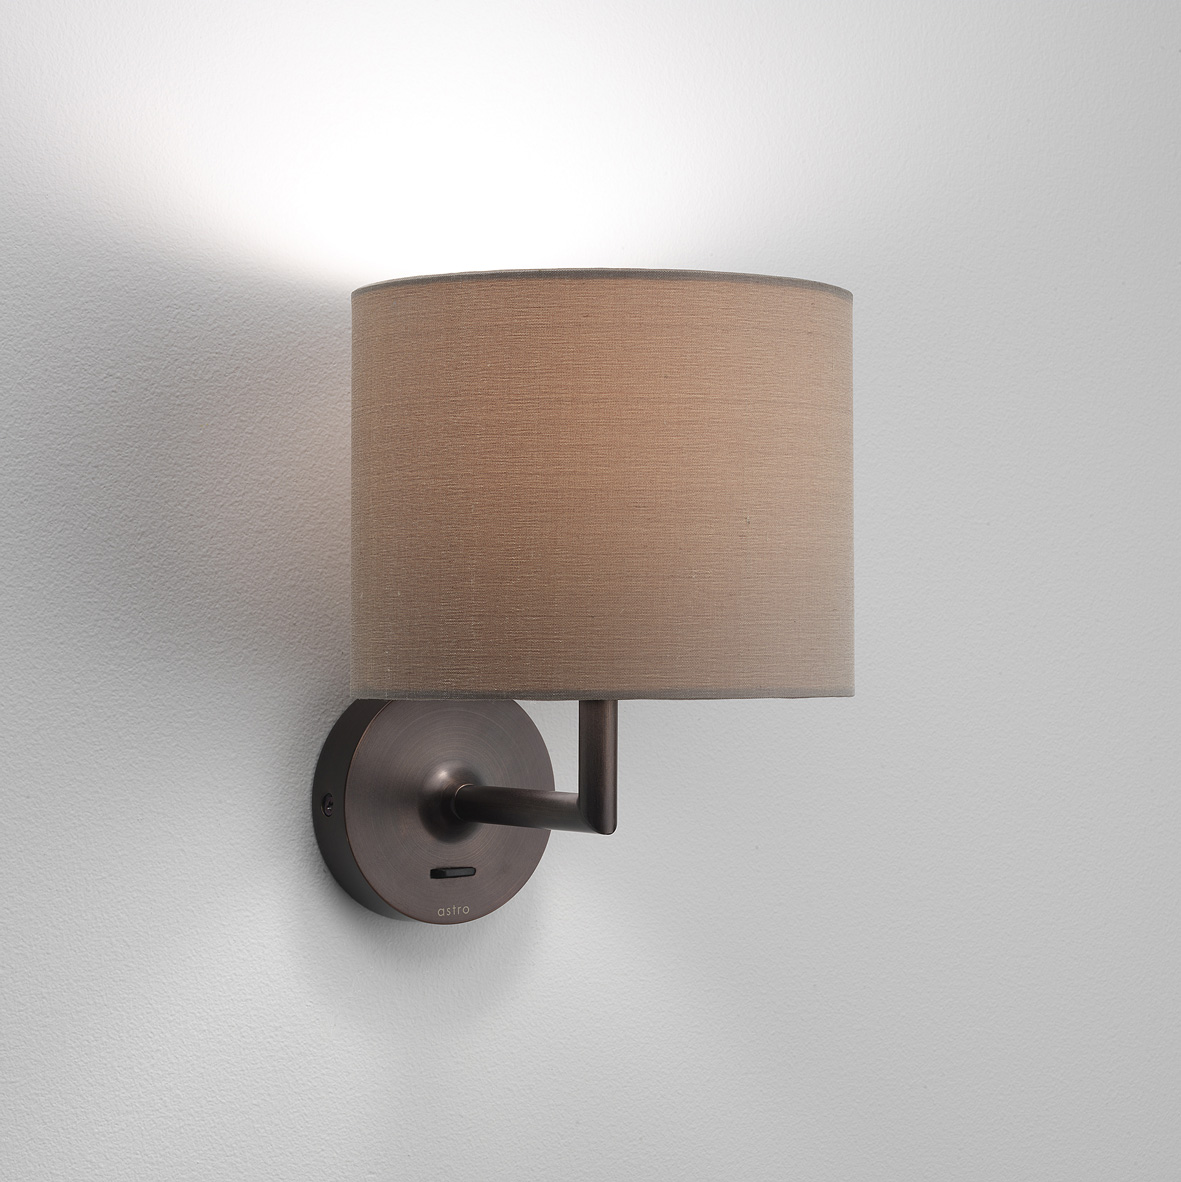 Astro appa interior wall light 60w e14 lamp switched chrome matt sentinel astro appa interior wall light 60w e14 lamp switched chrome matt nickel bronze aloadofball Gallery